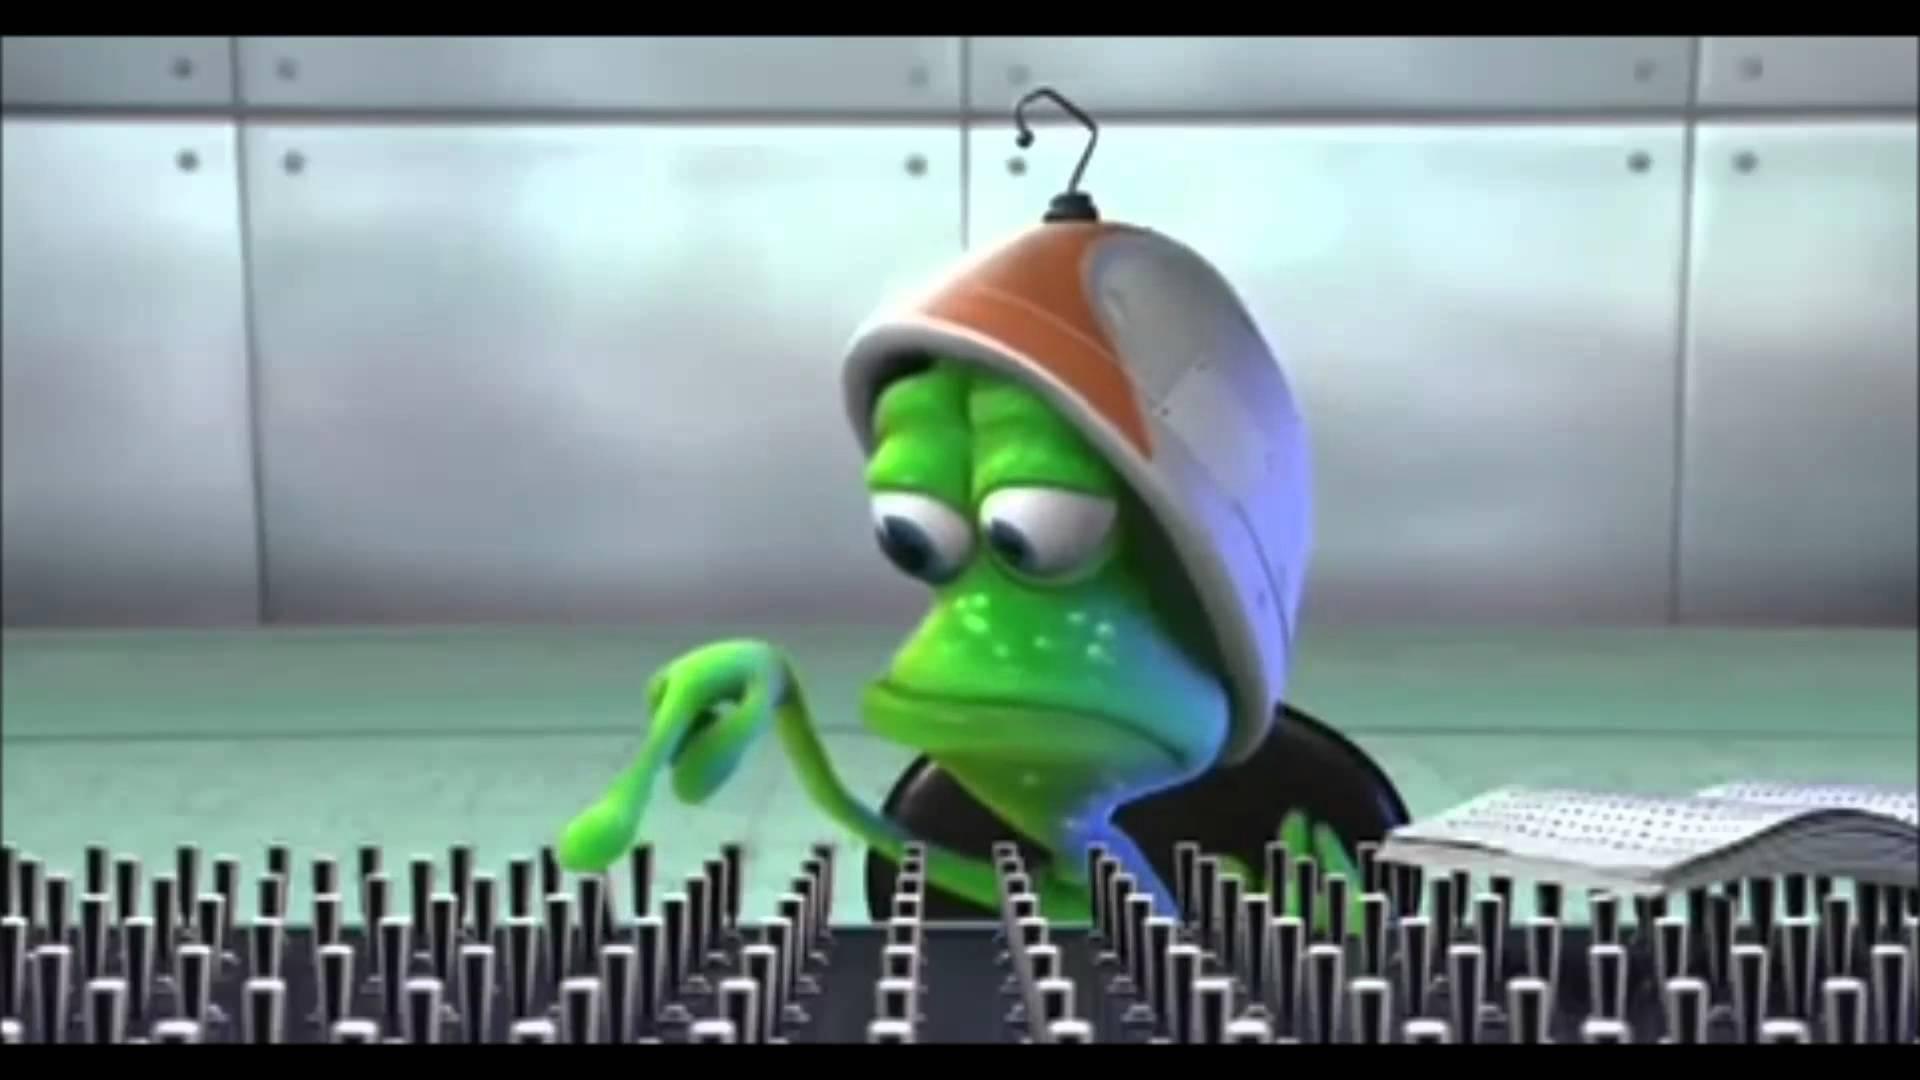 http://kinderserien.tv/wp-content/uploads/2014/10/pixar-lifted.jpg